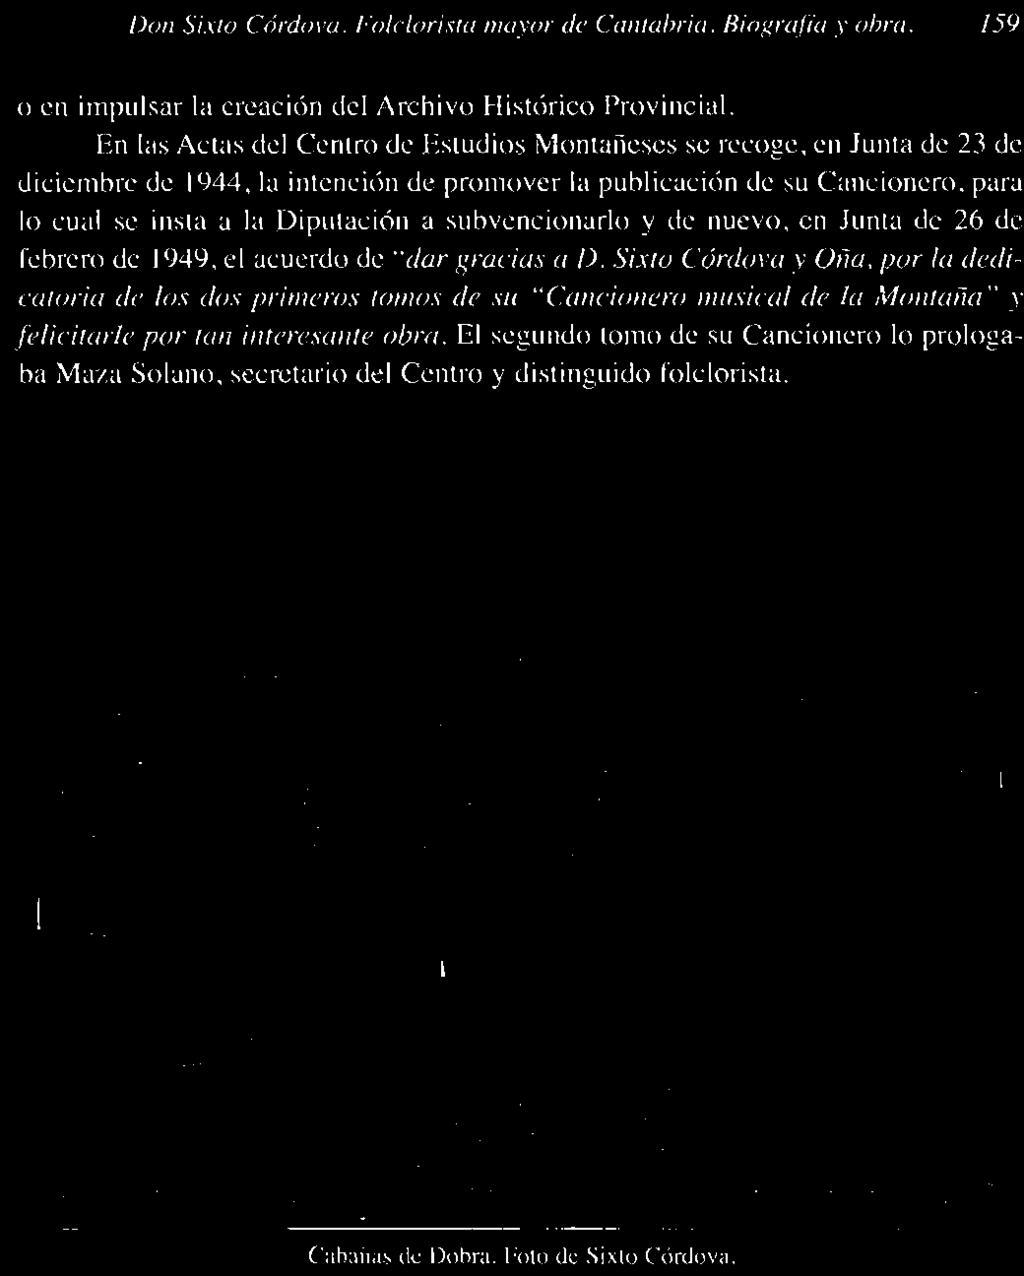 Liberales corneador maresme en Salta-7231